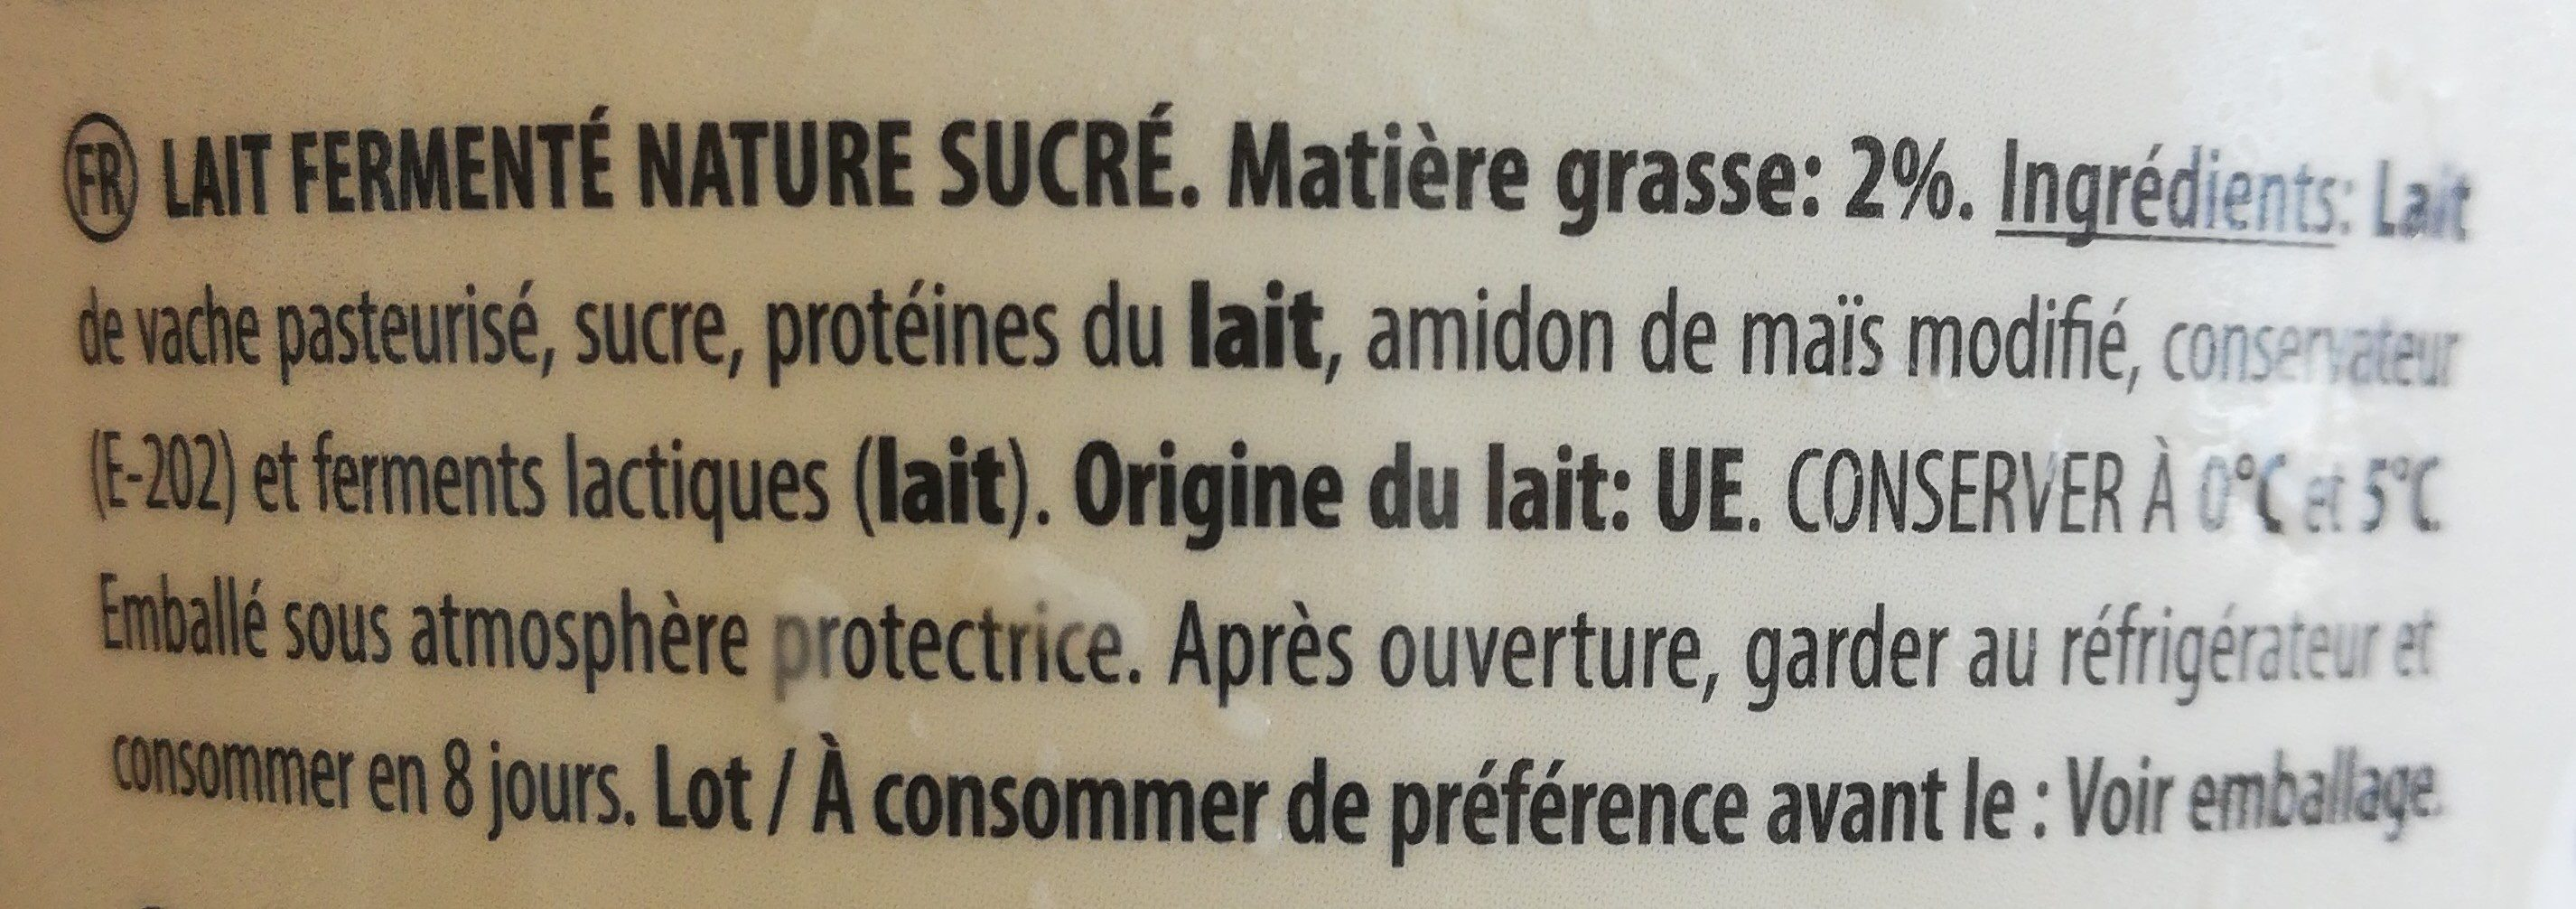 Yaourt nature sucré - Ingredients - fr